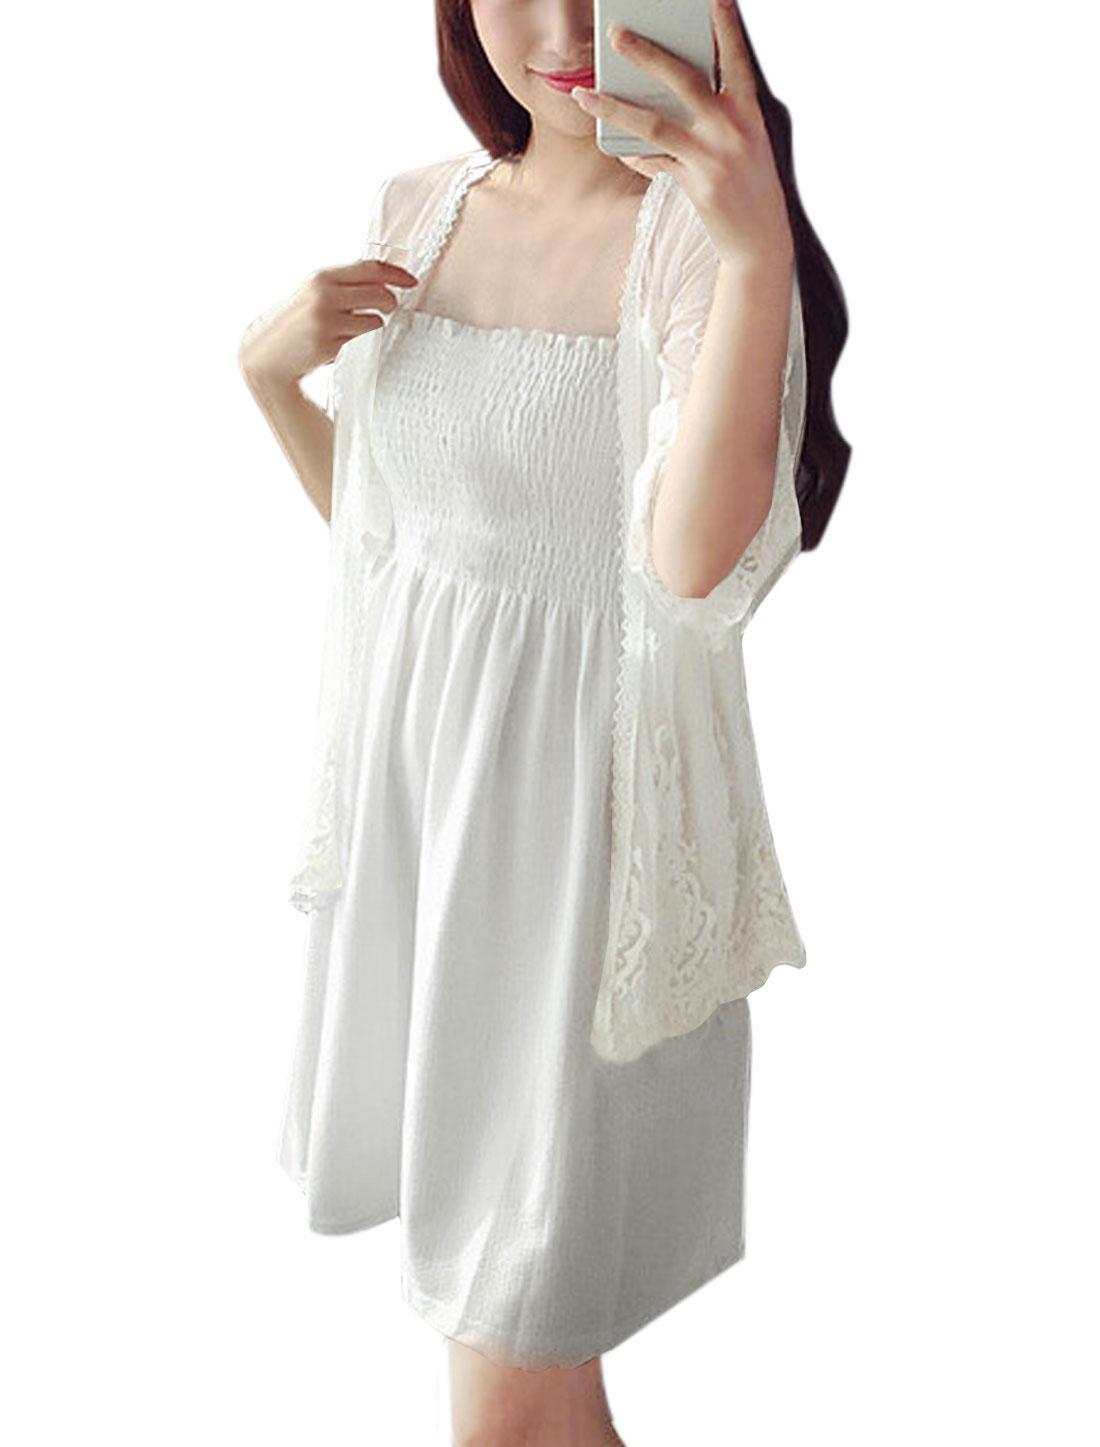 Women Flower Embrodiery 3/4 Sleeves Semi Sheer Mesh Cardigan White XS